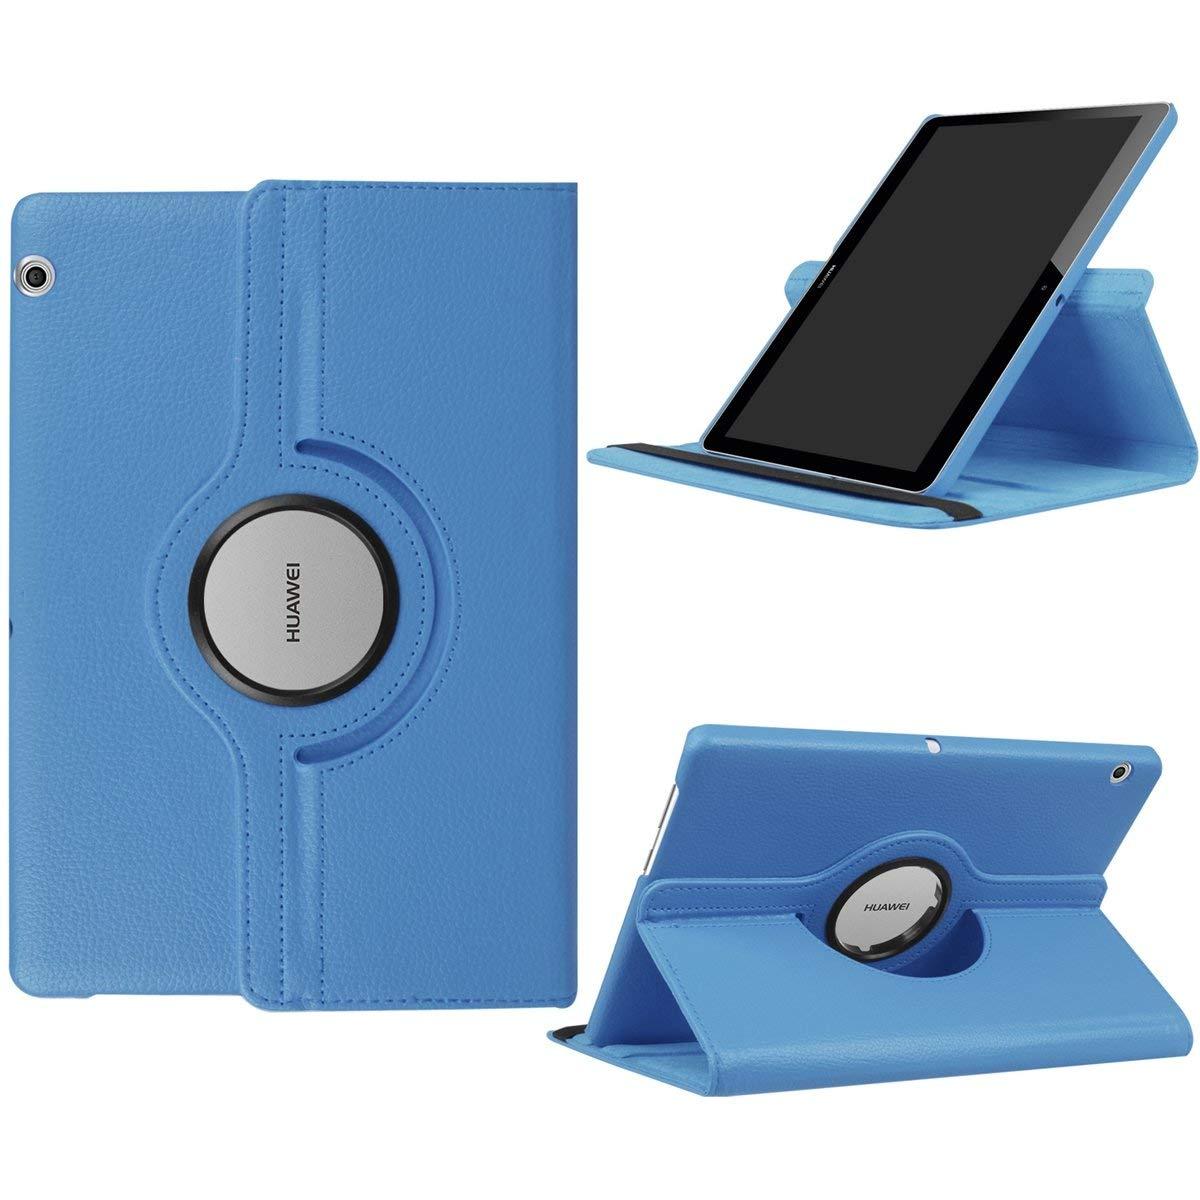 360 Rotating Case Shell For Huawei Mediapad T3 10 9.6